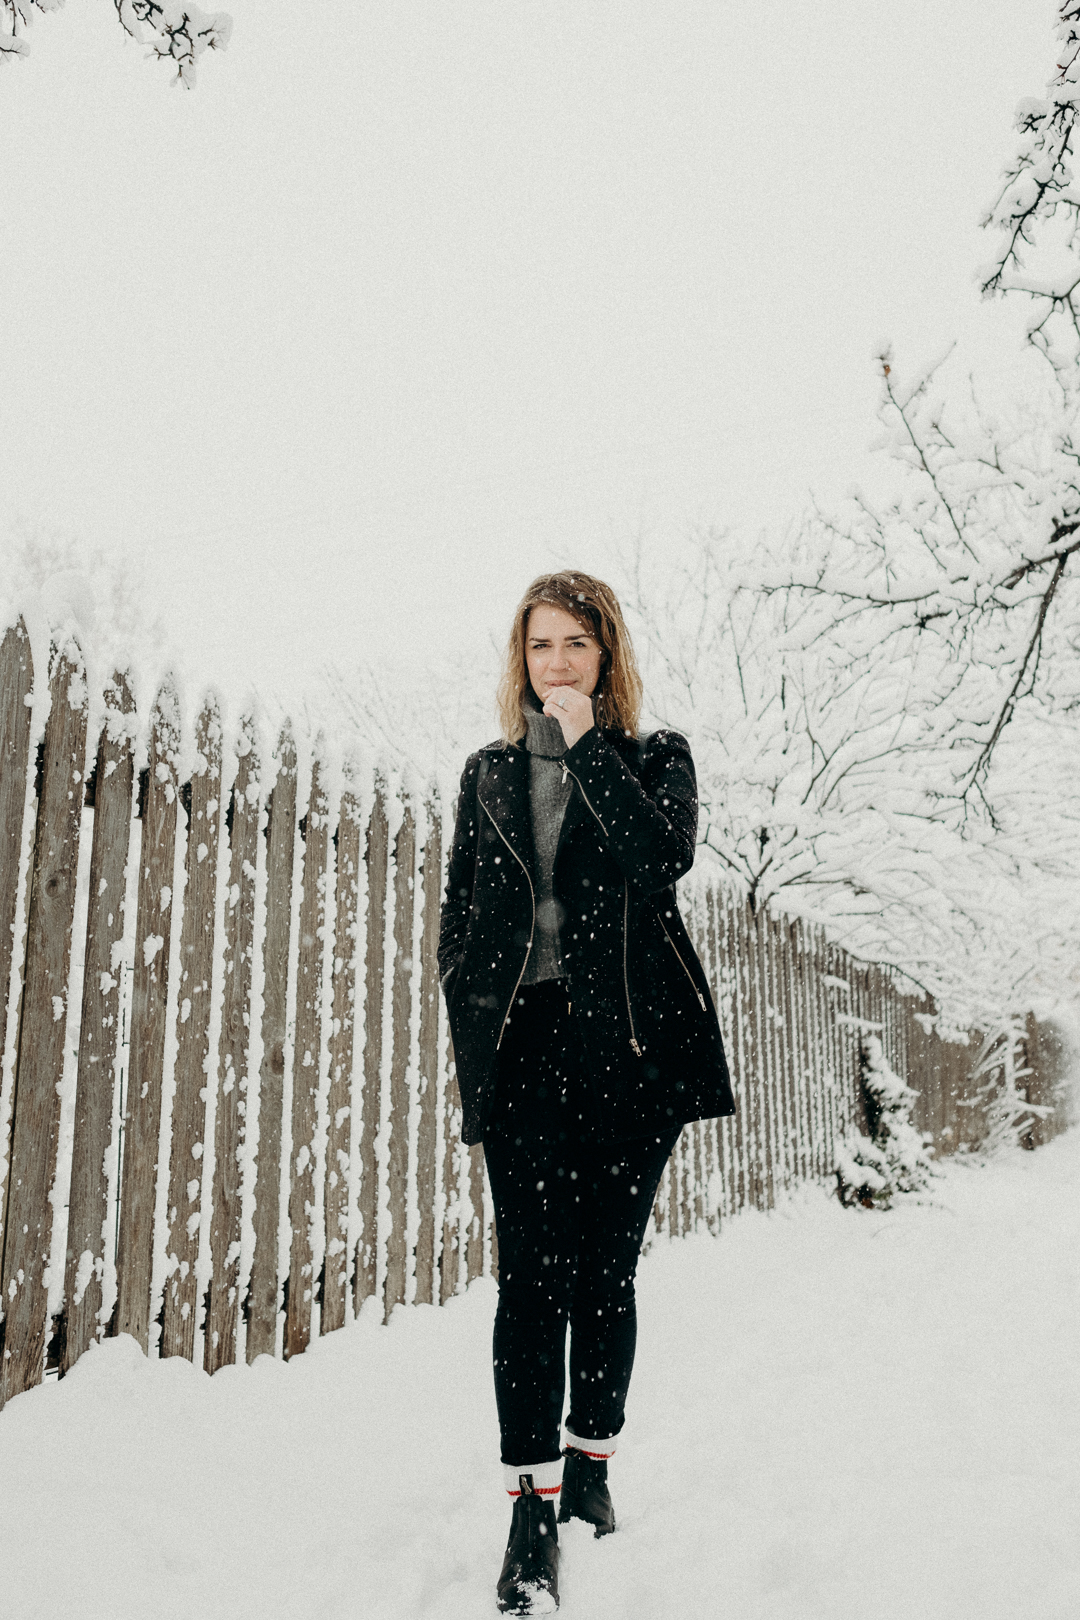 20190112_snowydaysin_kansascity_alihapperphoto_9.jpg